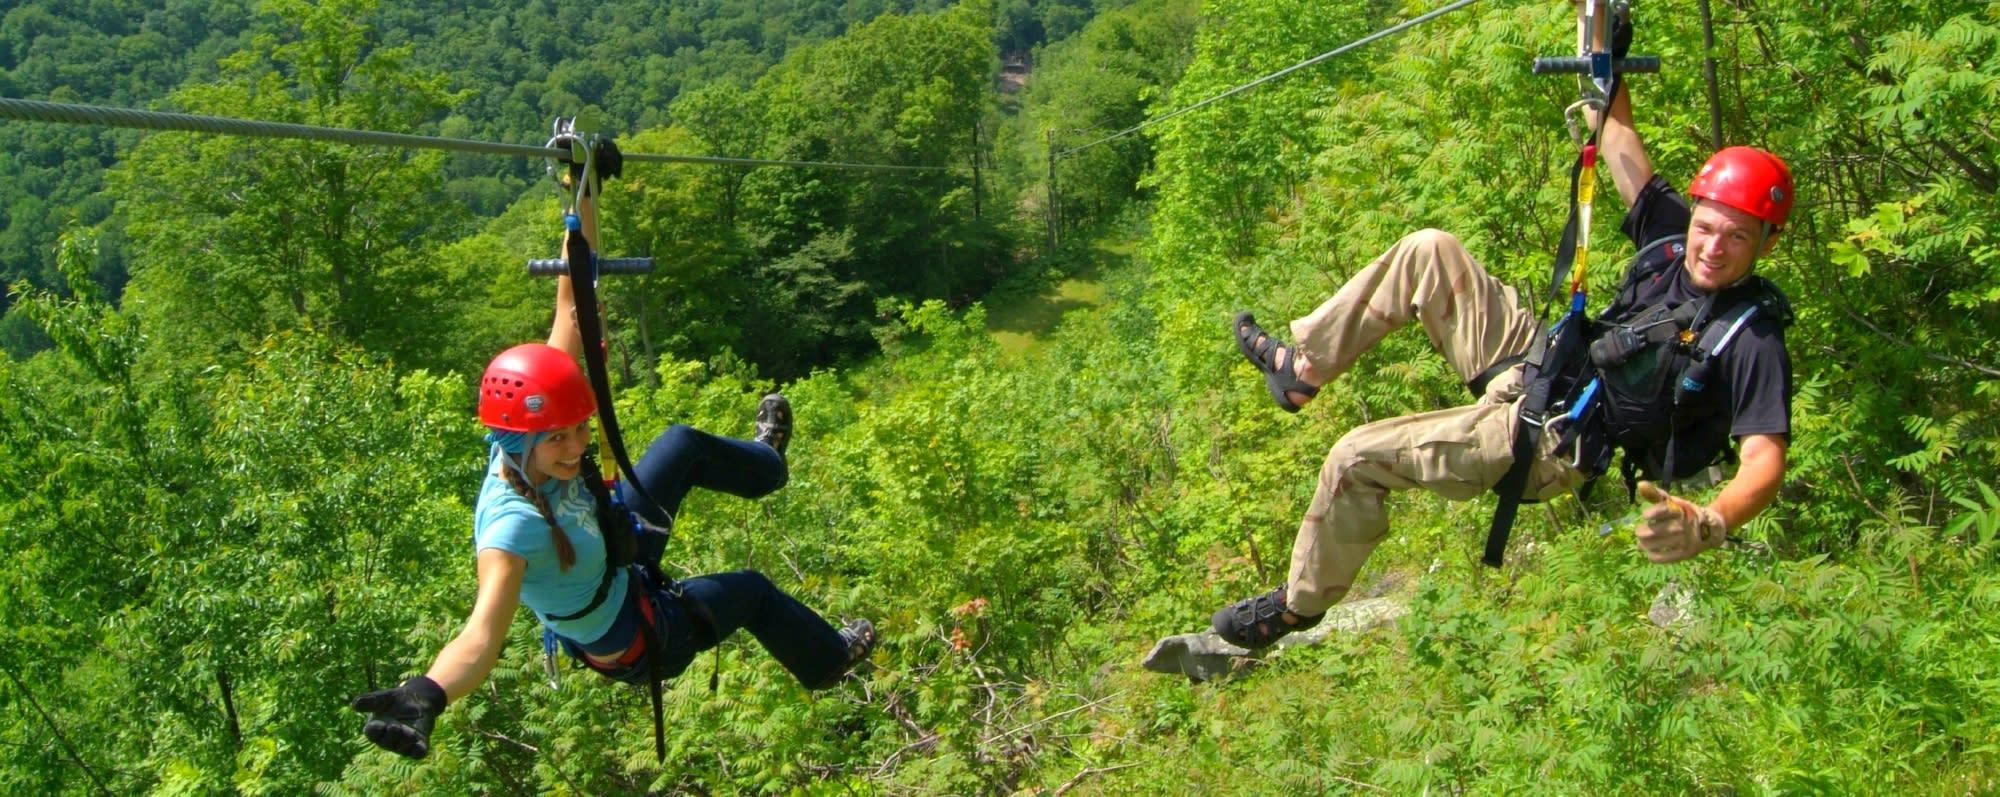 Zipline tour package - hunter mountain